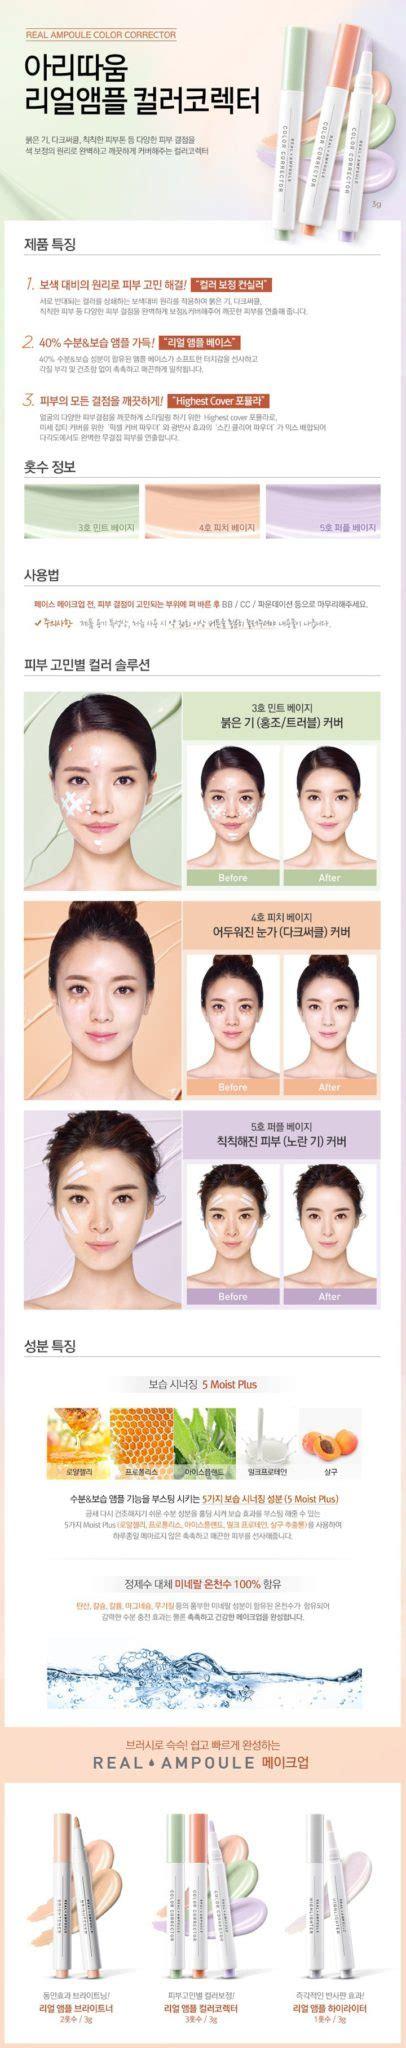 Aritaum Real Oule Color Corrector 1 aritaum real oule color corrector best korean